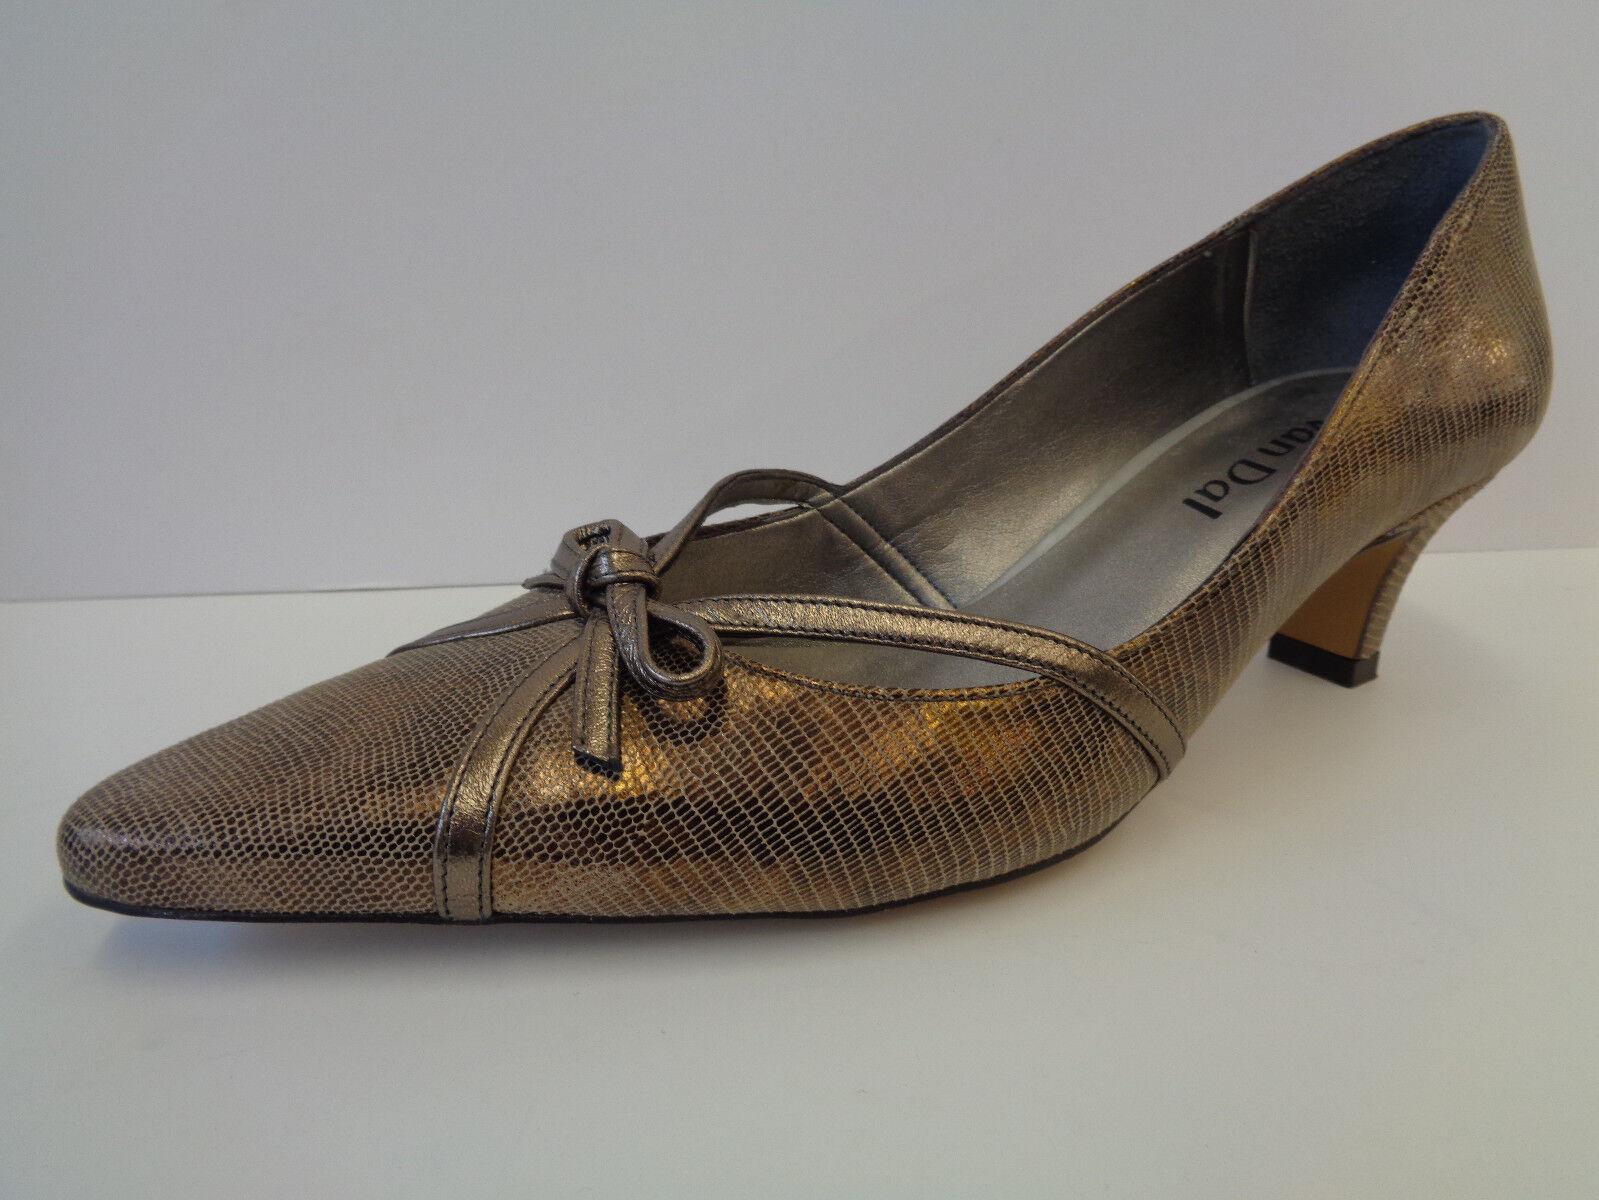 donna -multi Bronze Liz   Hartzinn erf 65533;llt  Slipper Leder mit Abseaz Van Dal  grandi offerte